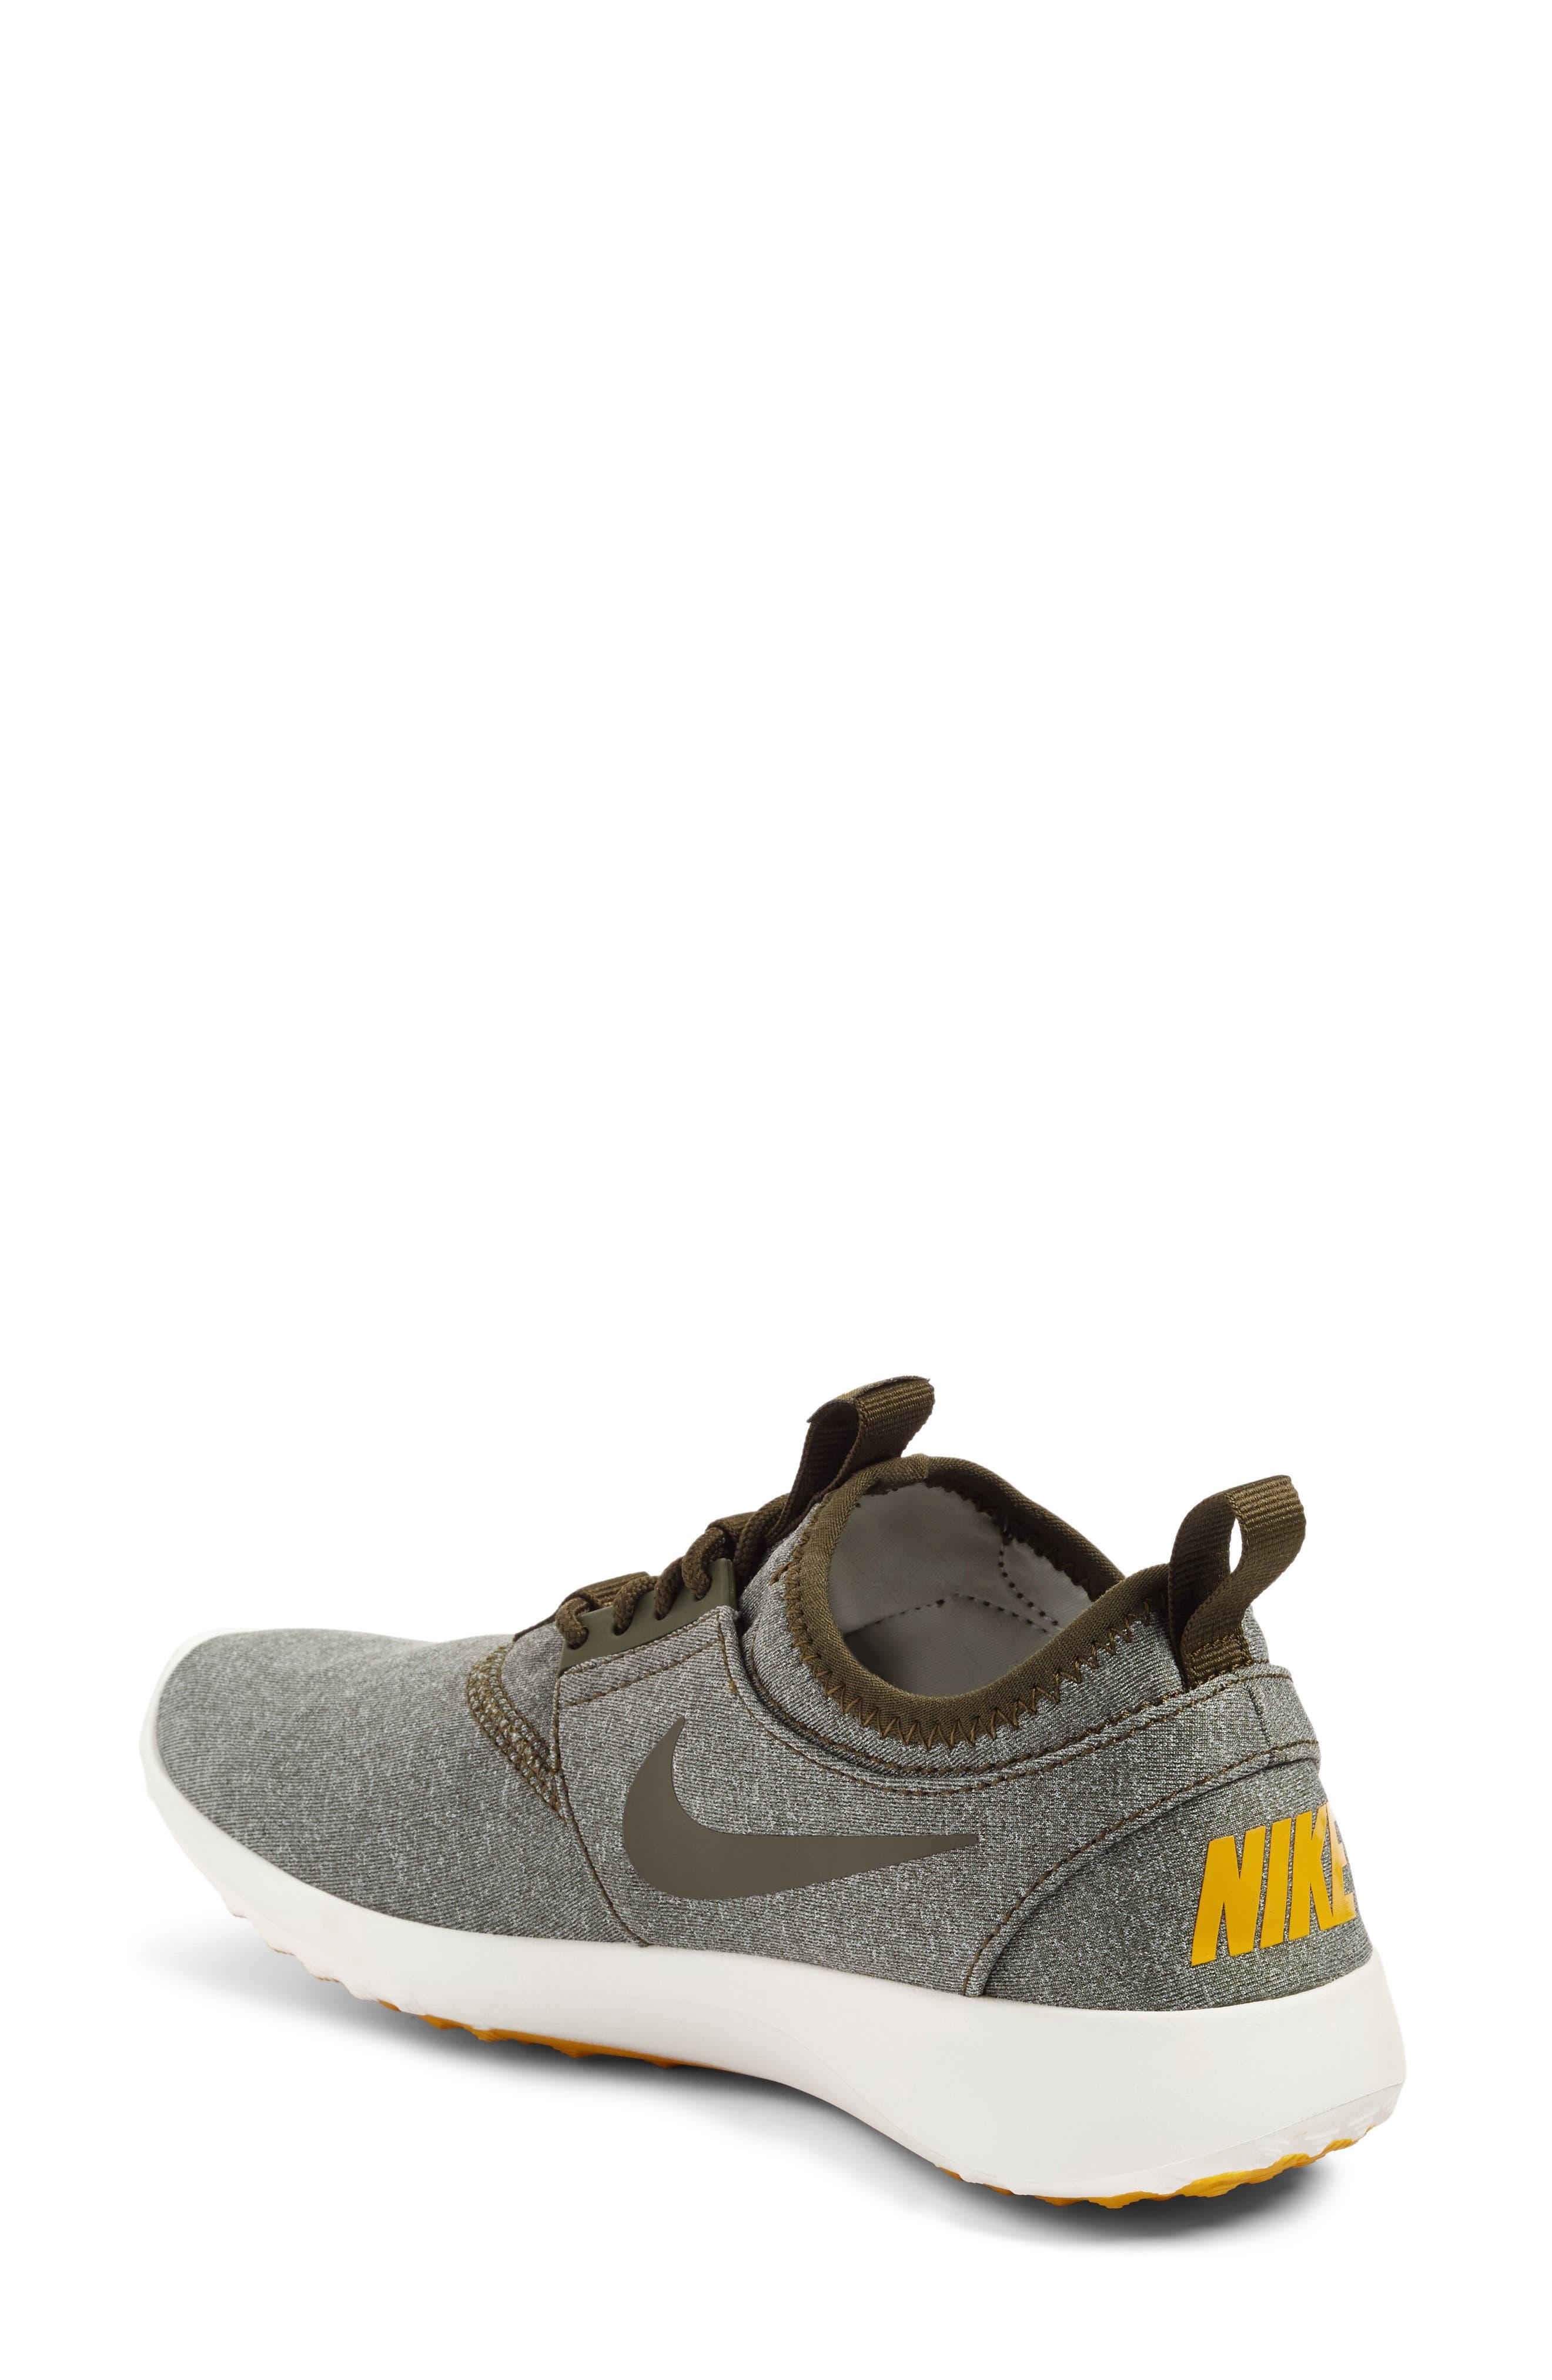 Juvenate SE Sneaker,                             Alternate thumbnail 29, color,